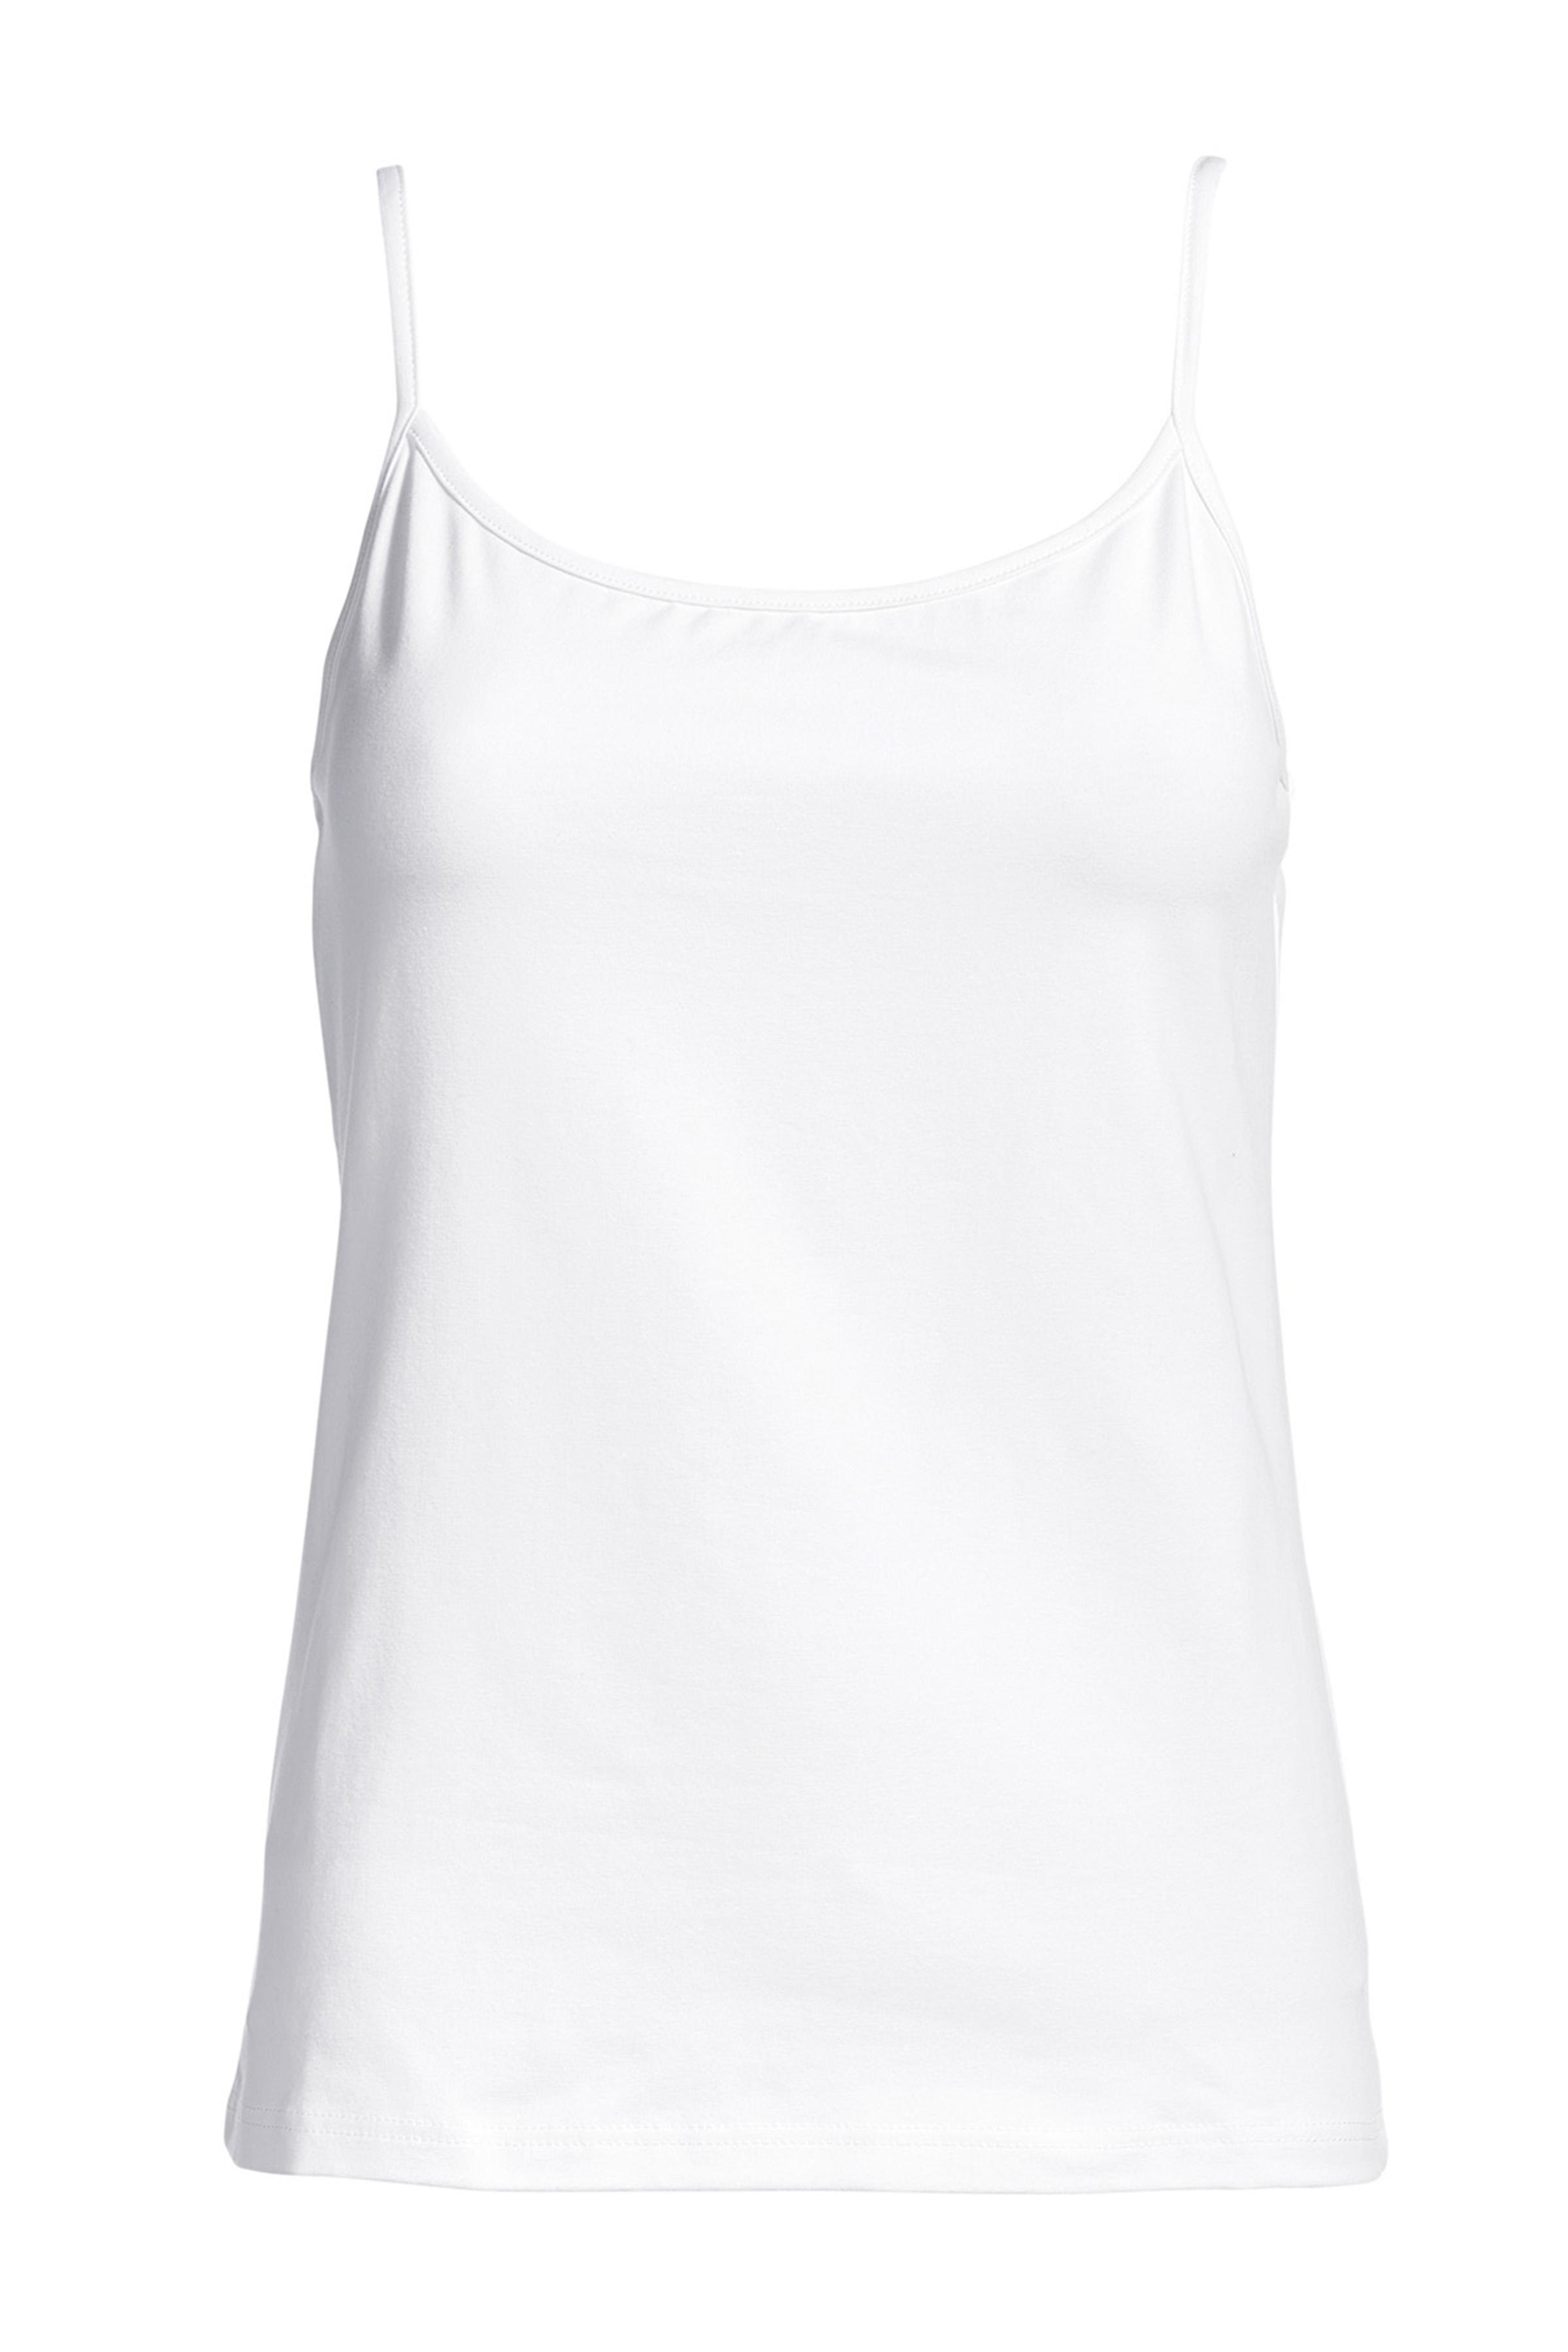 Image of BonA Parte Dame Must-have top - Hvid